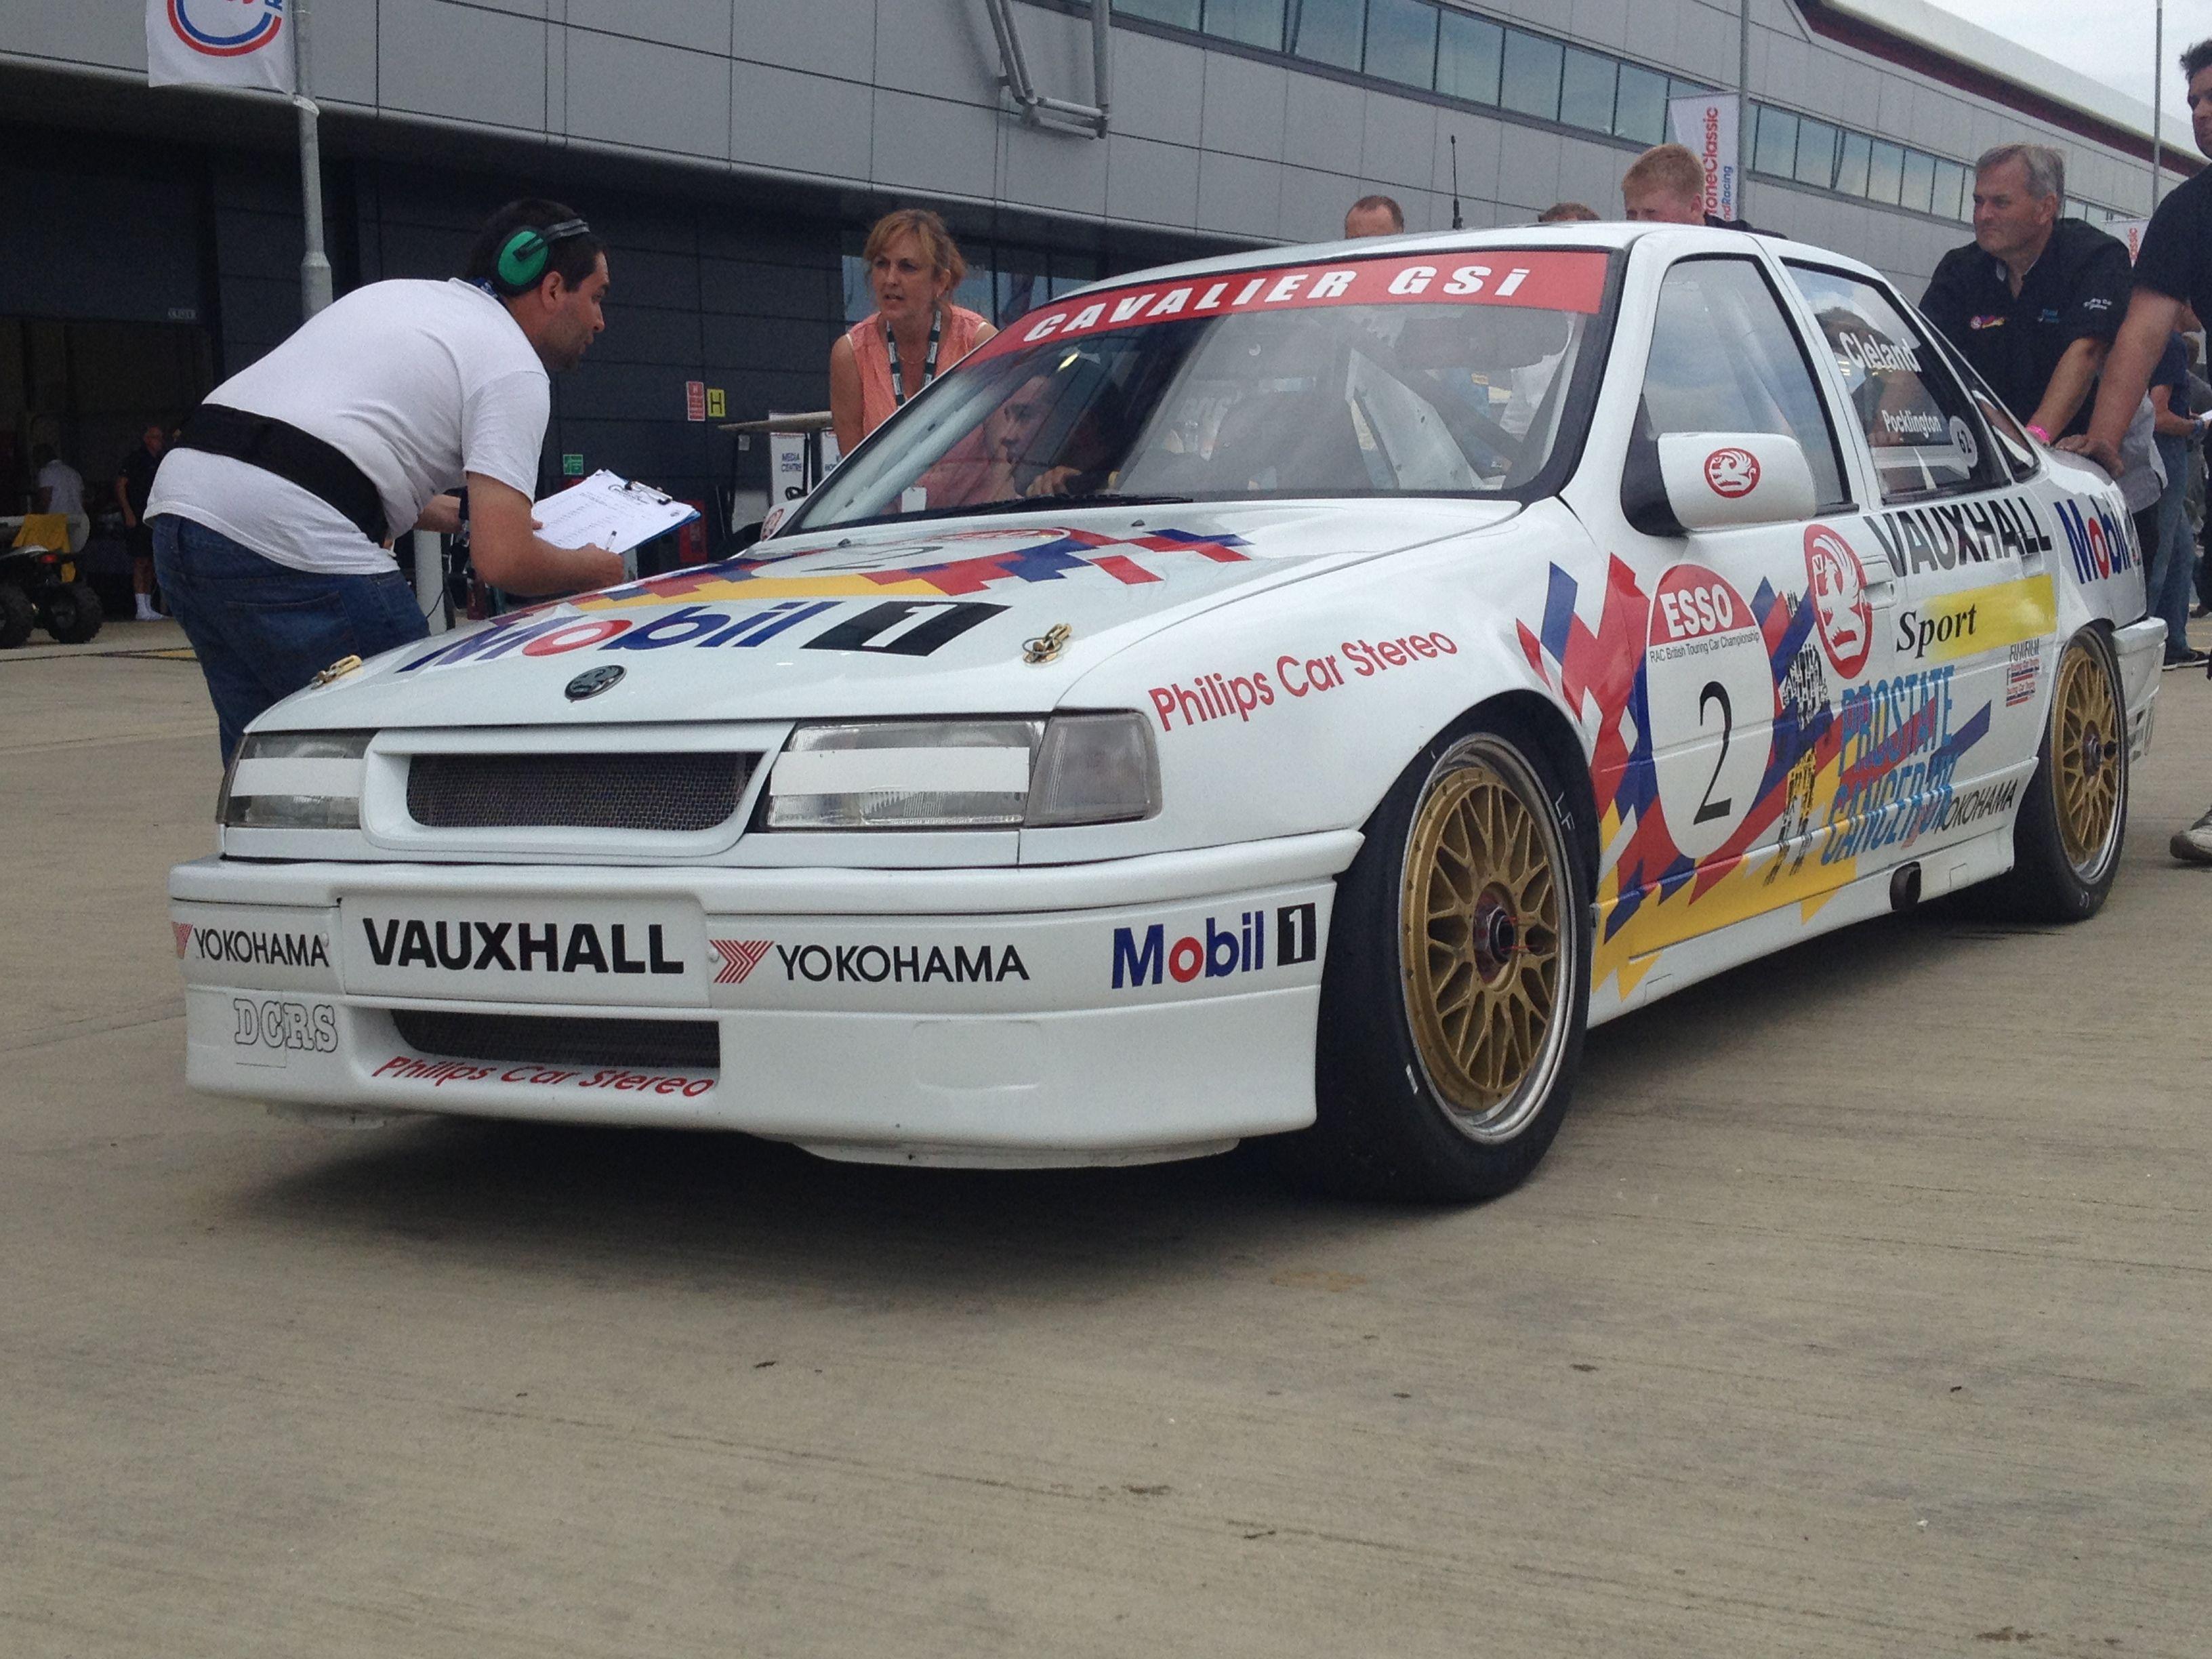 John Clelands Cavalier Gm Car Btcc Vauxhall